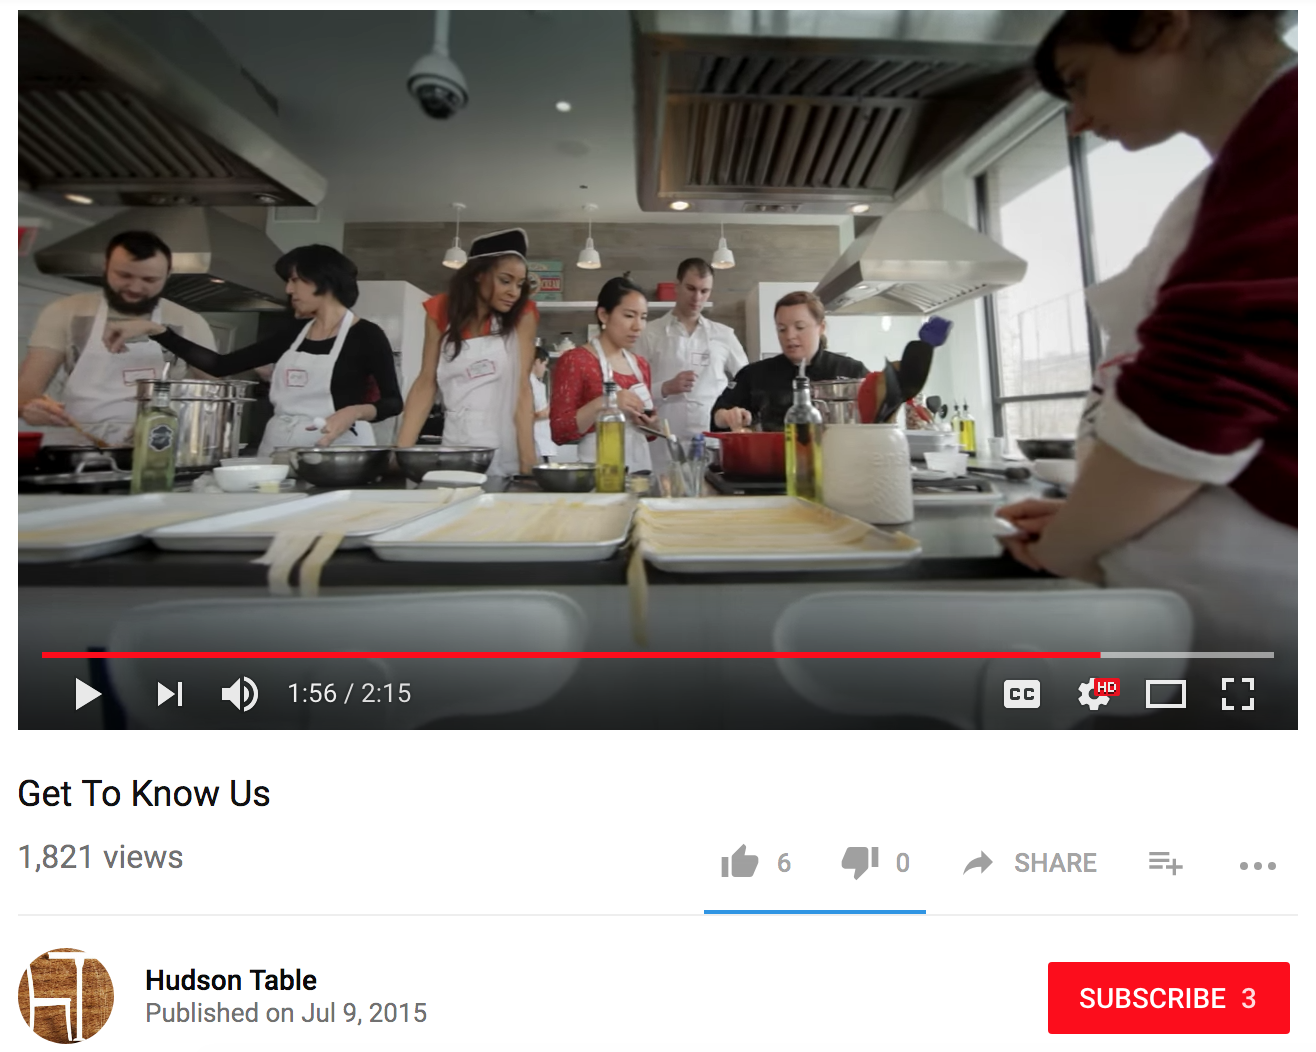 Culinary Teaching Video - Hudson Table Culinary Studio